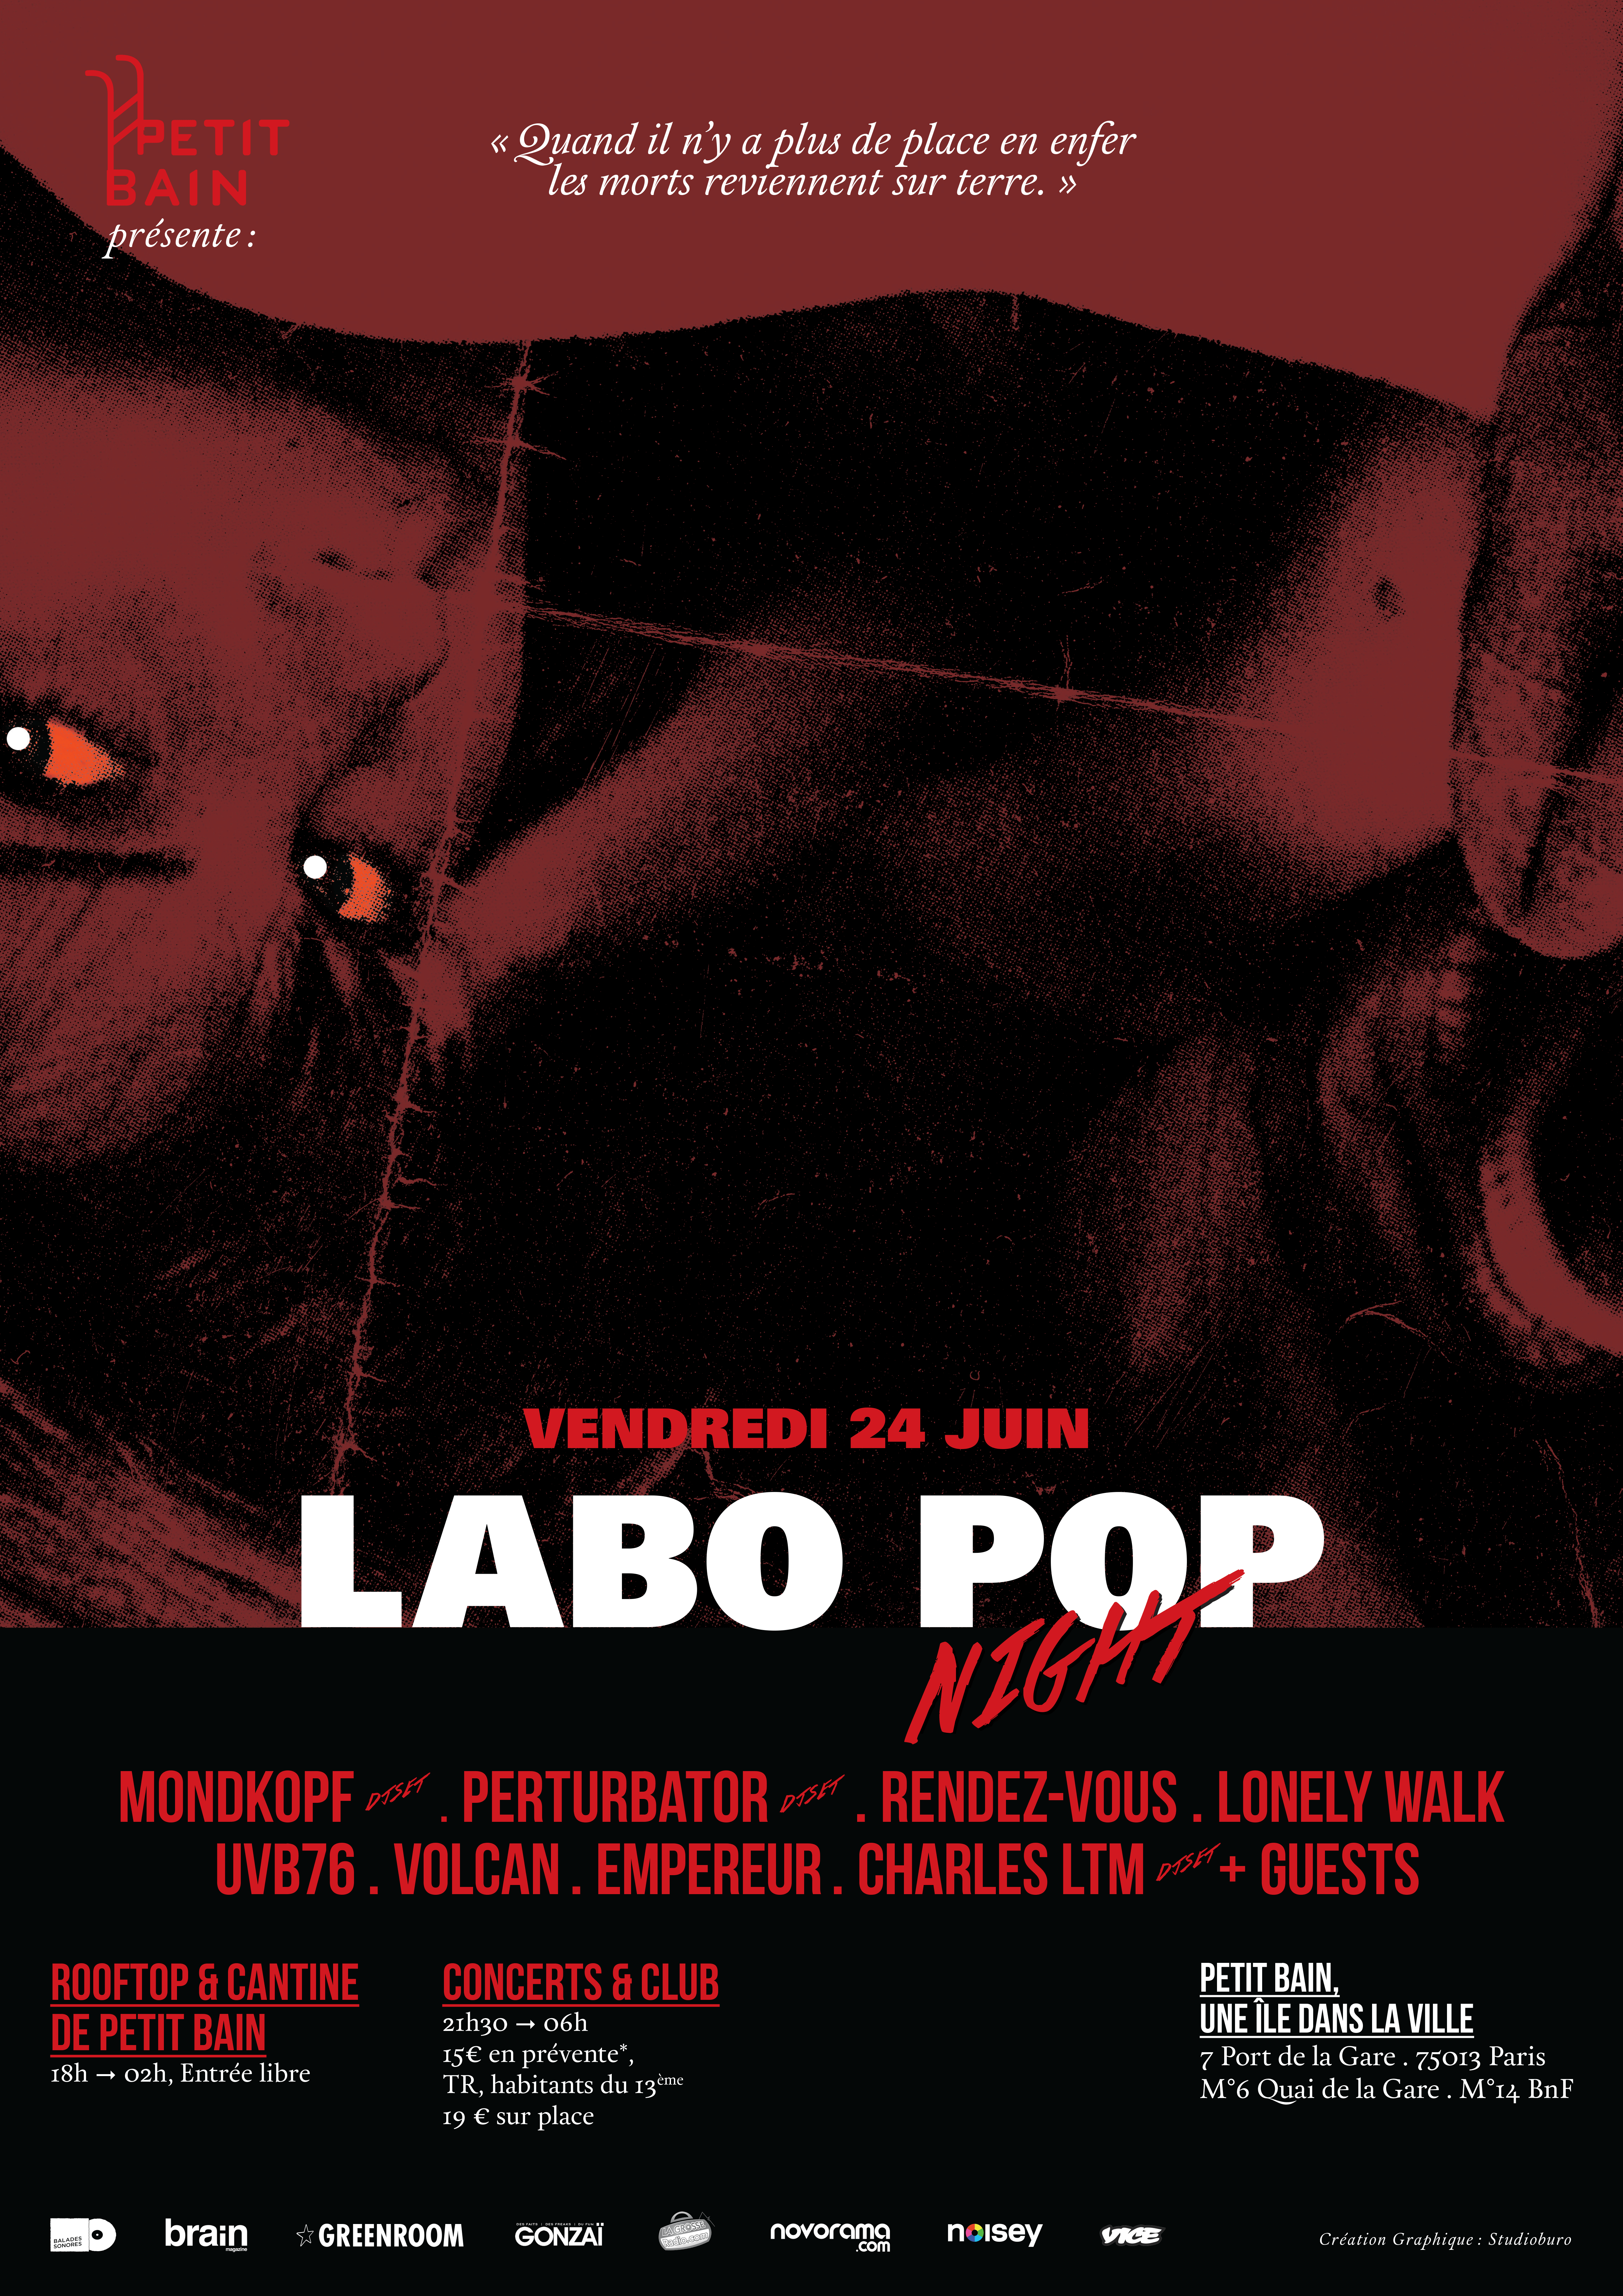 PB-LABOPOP-NIGHT-AFFICHE-OK